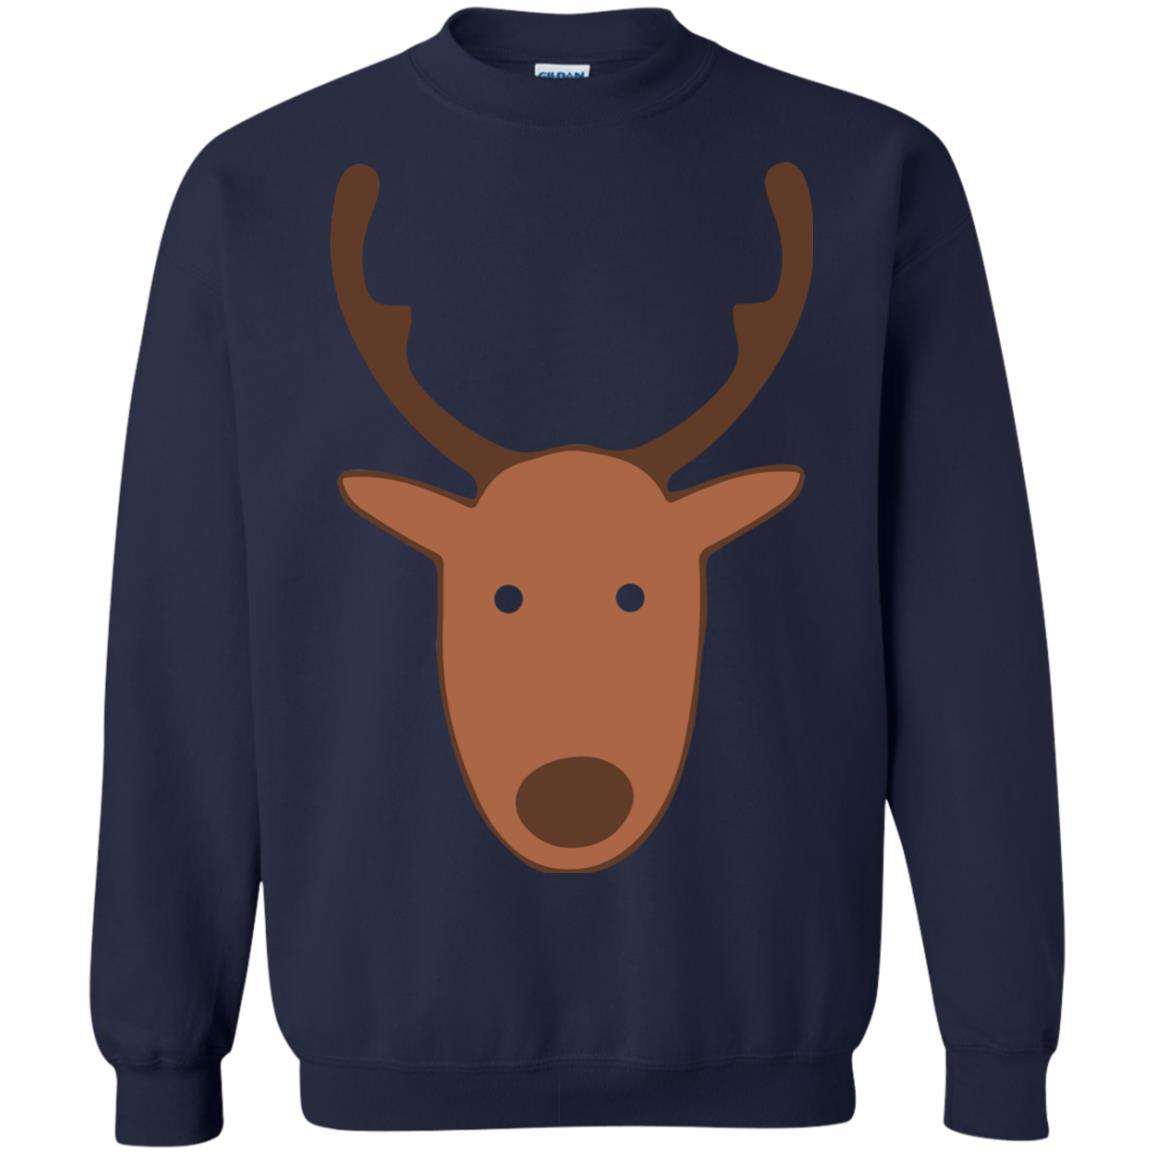 image 4774 - Tina Belcher Reindeer Christmas Sweater, Shirt, Hoodie